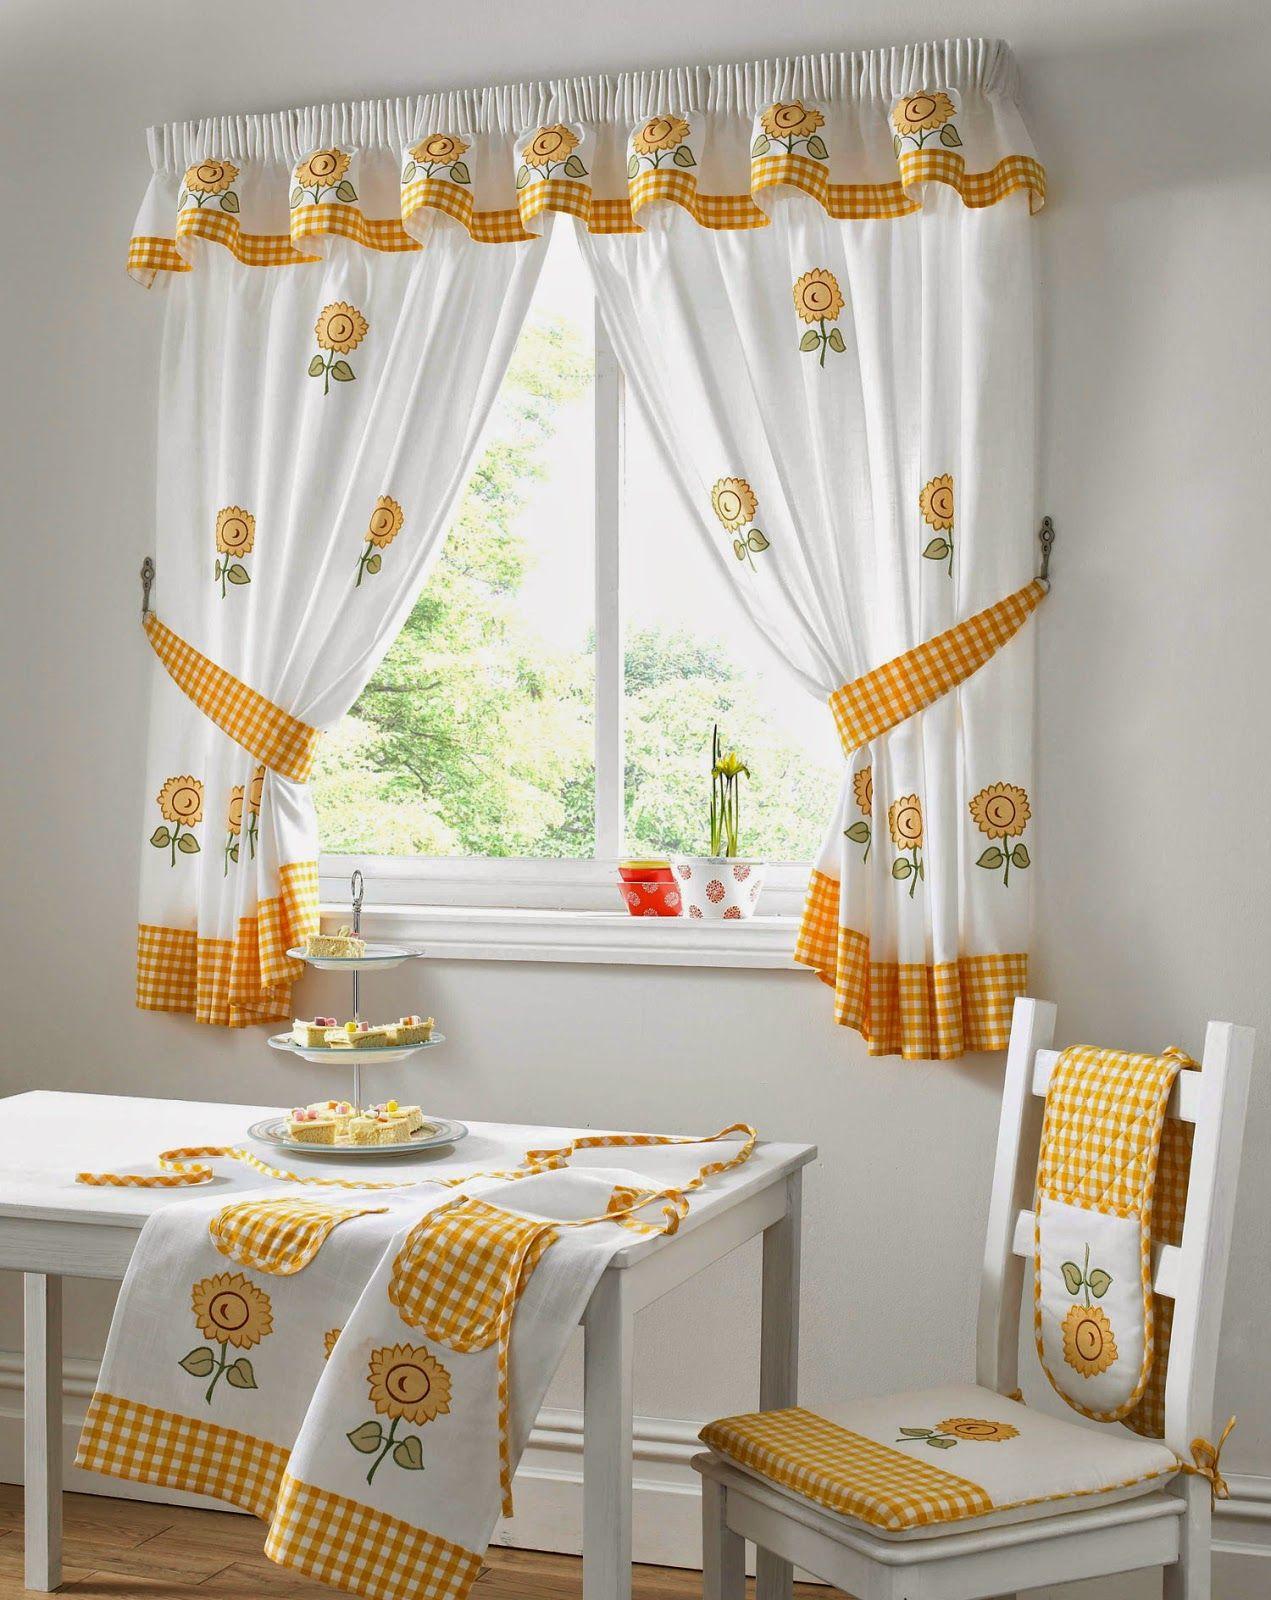 kitchen drapes sink parts curtains panels chef